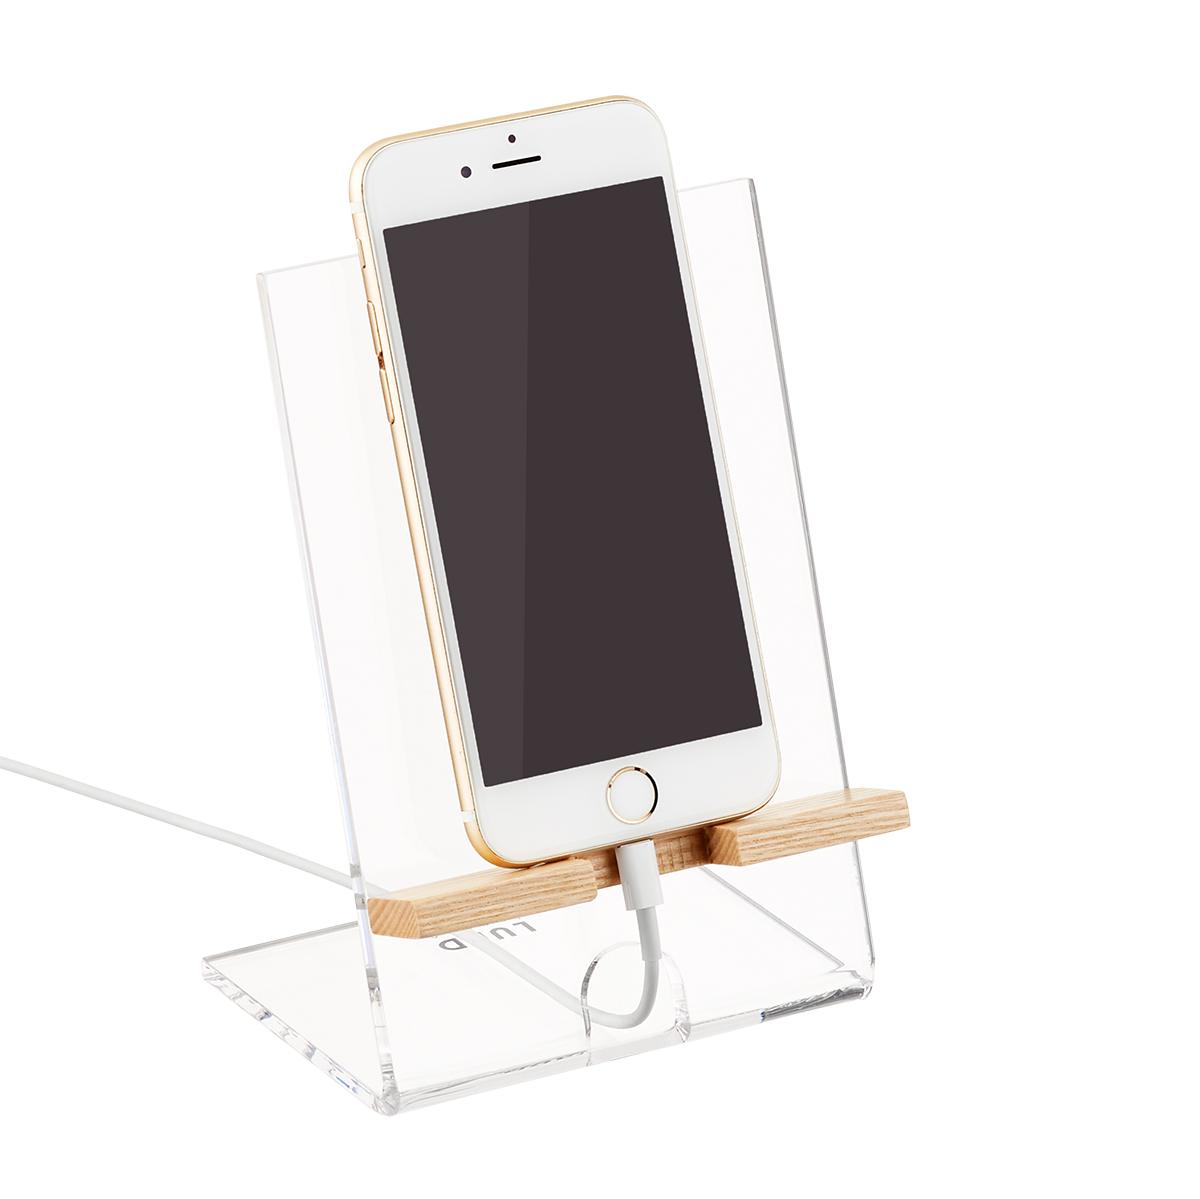 Nordic Phone Holder